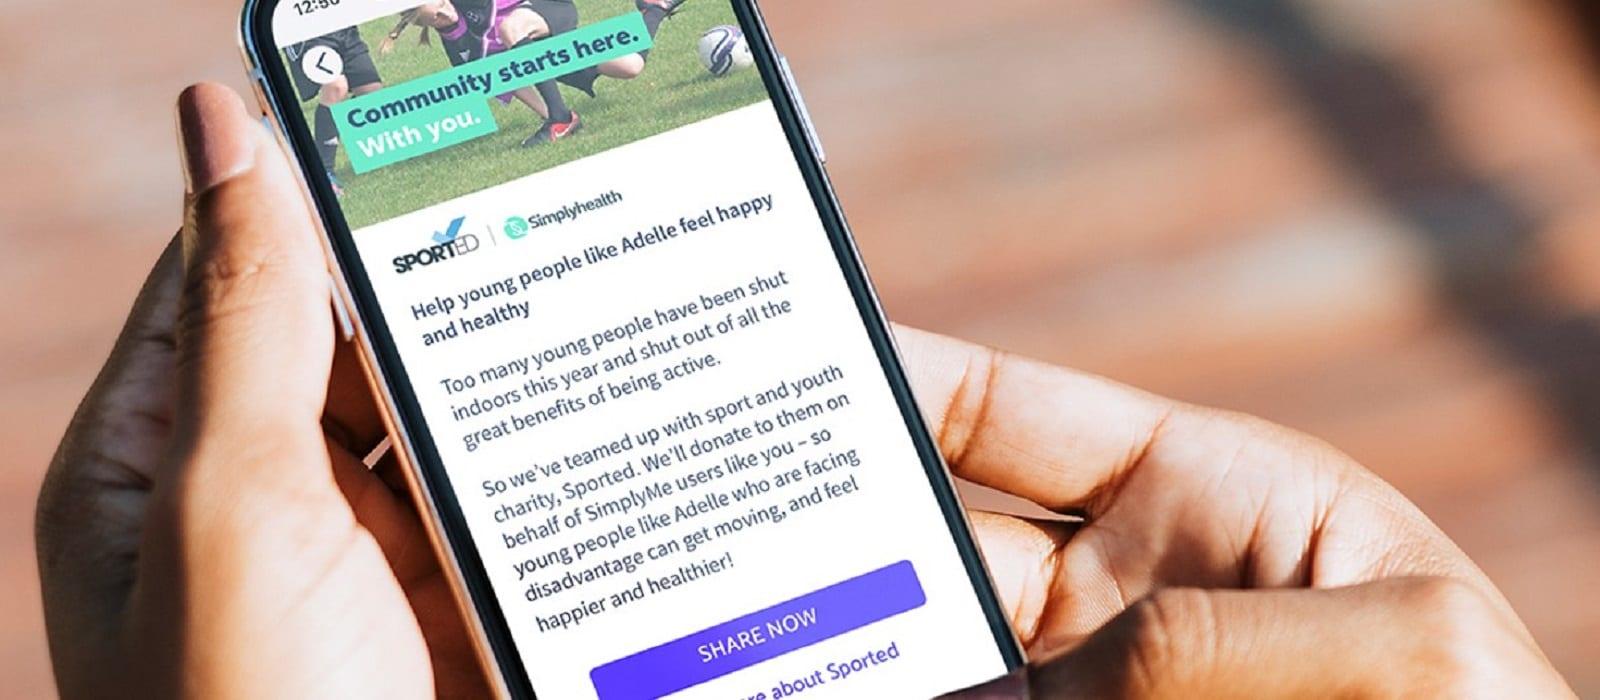 simplyhealth-app-research-health